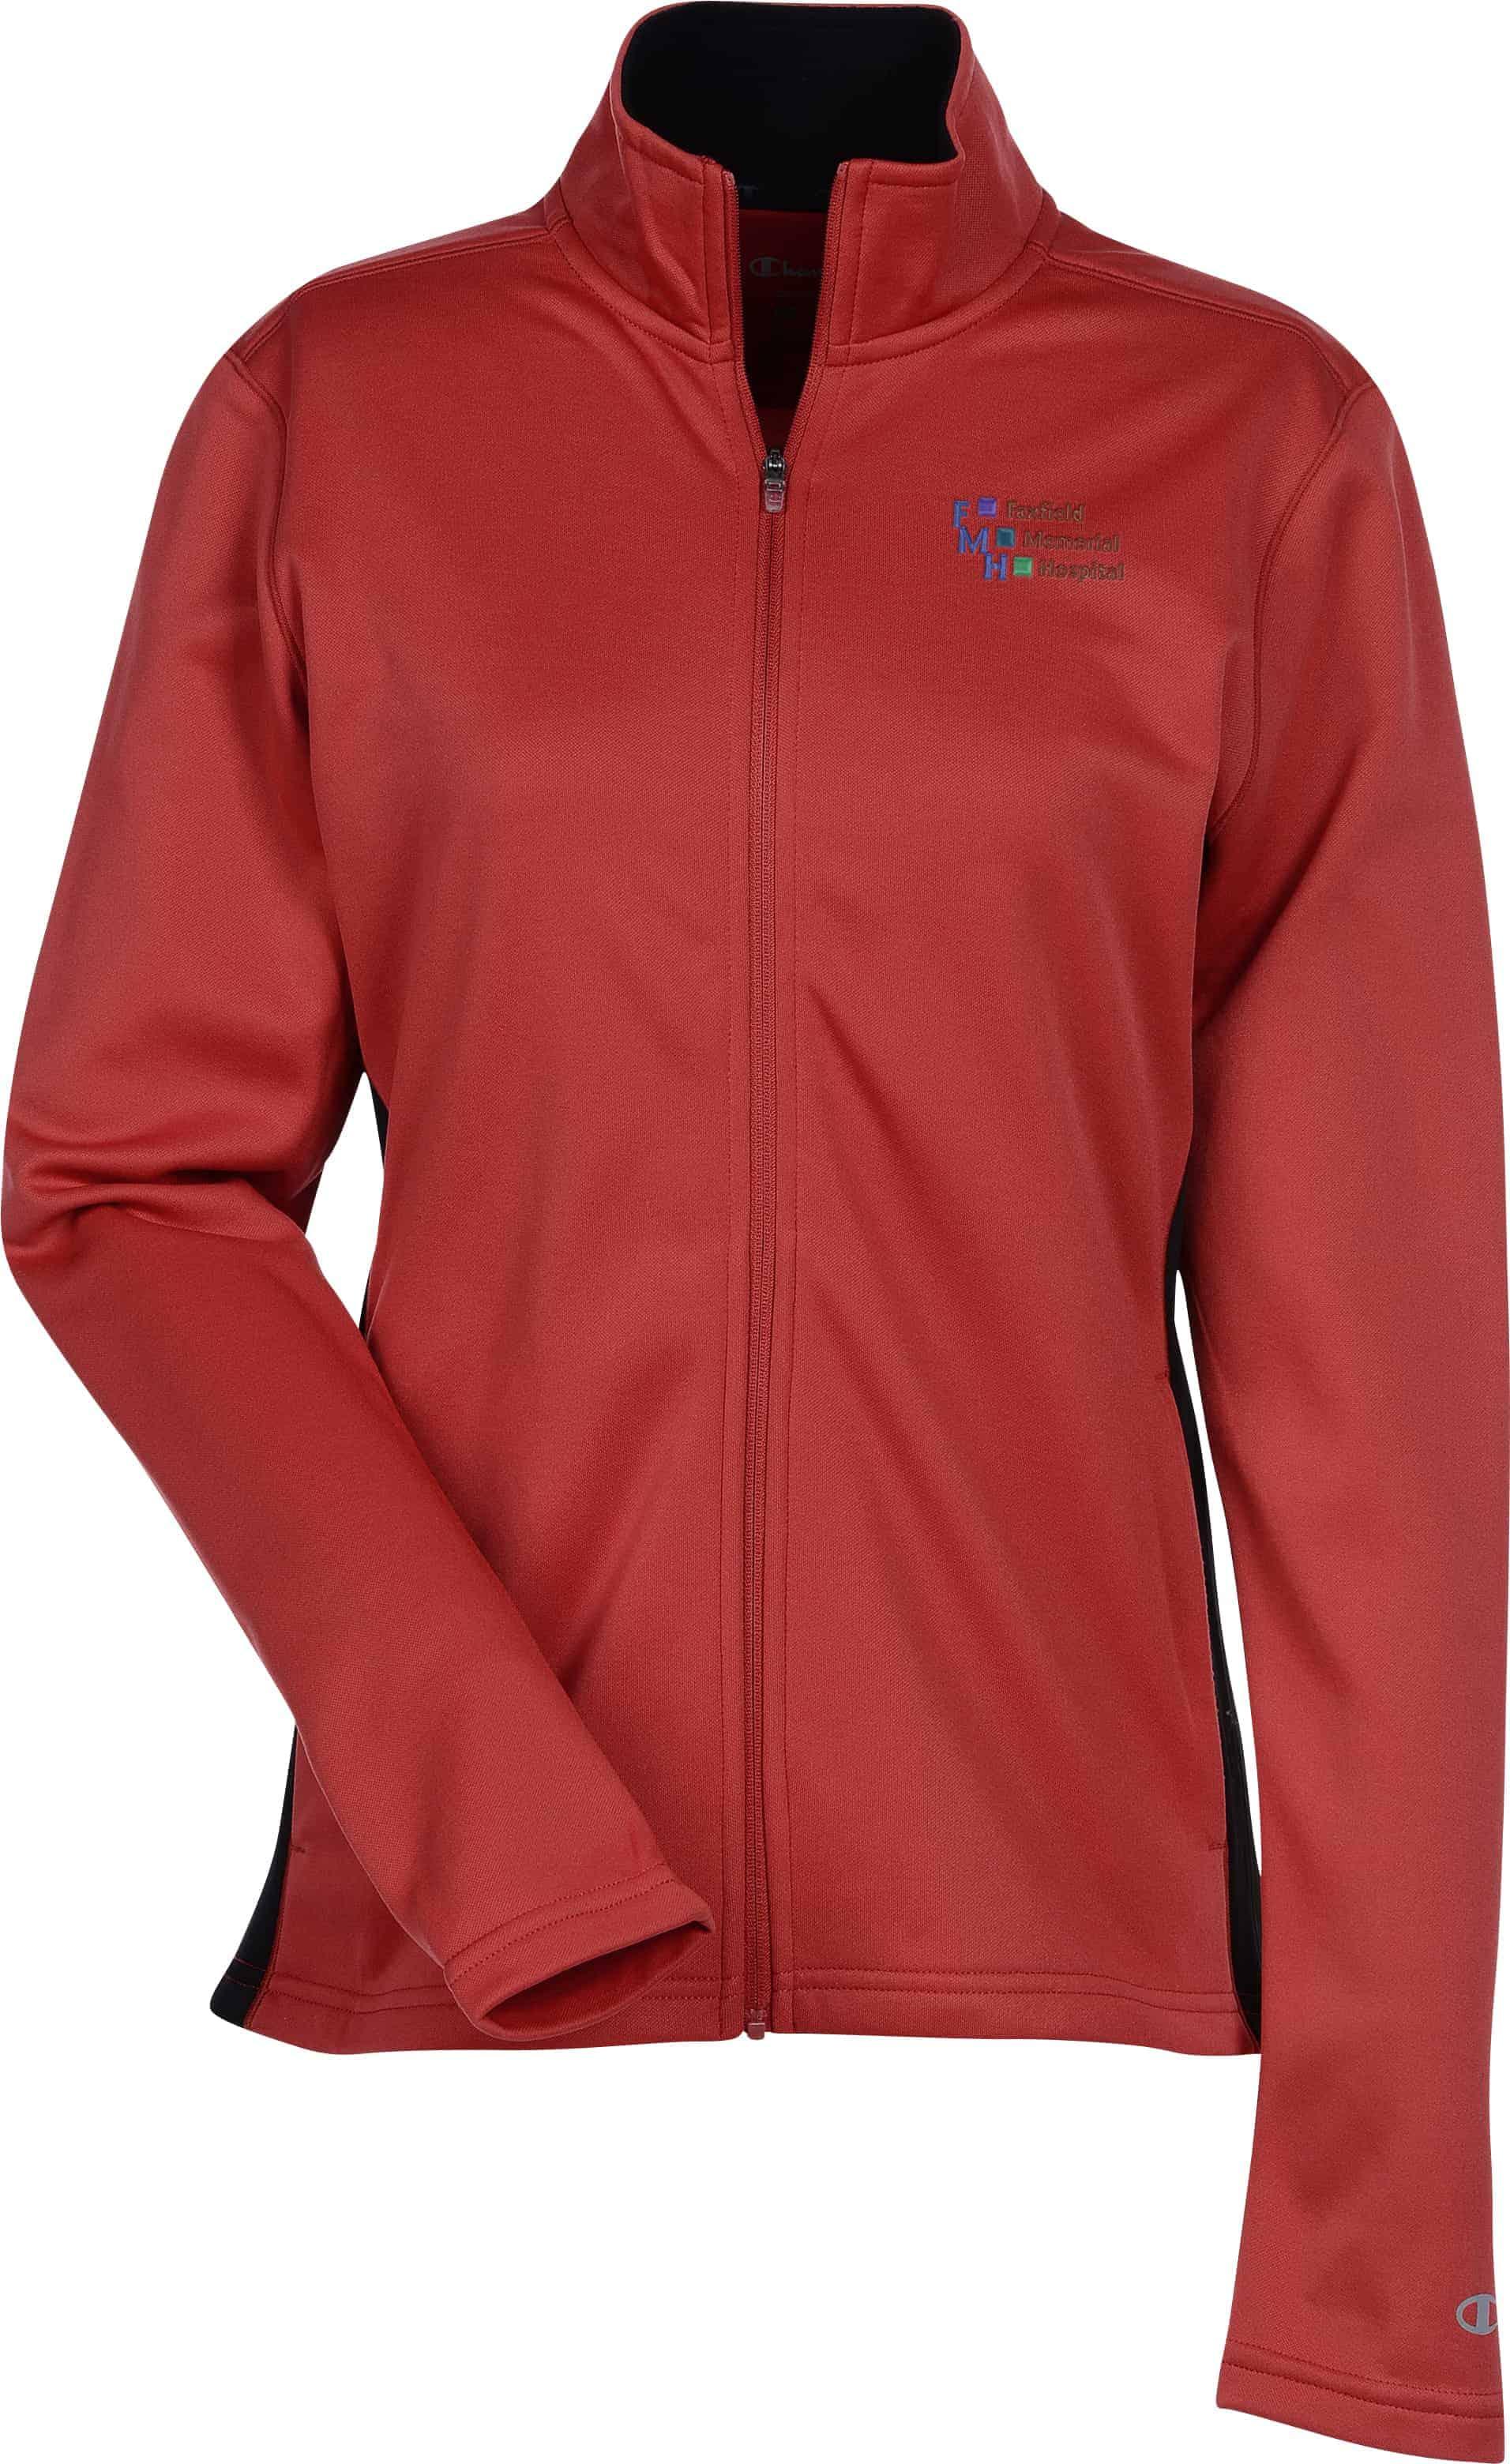 A long-sleeved light jacket with zipper.